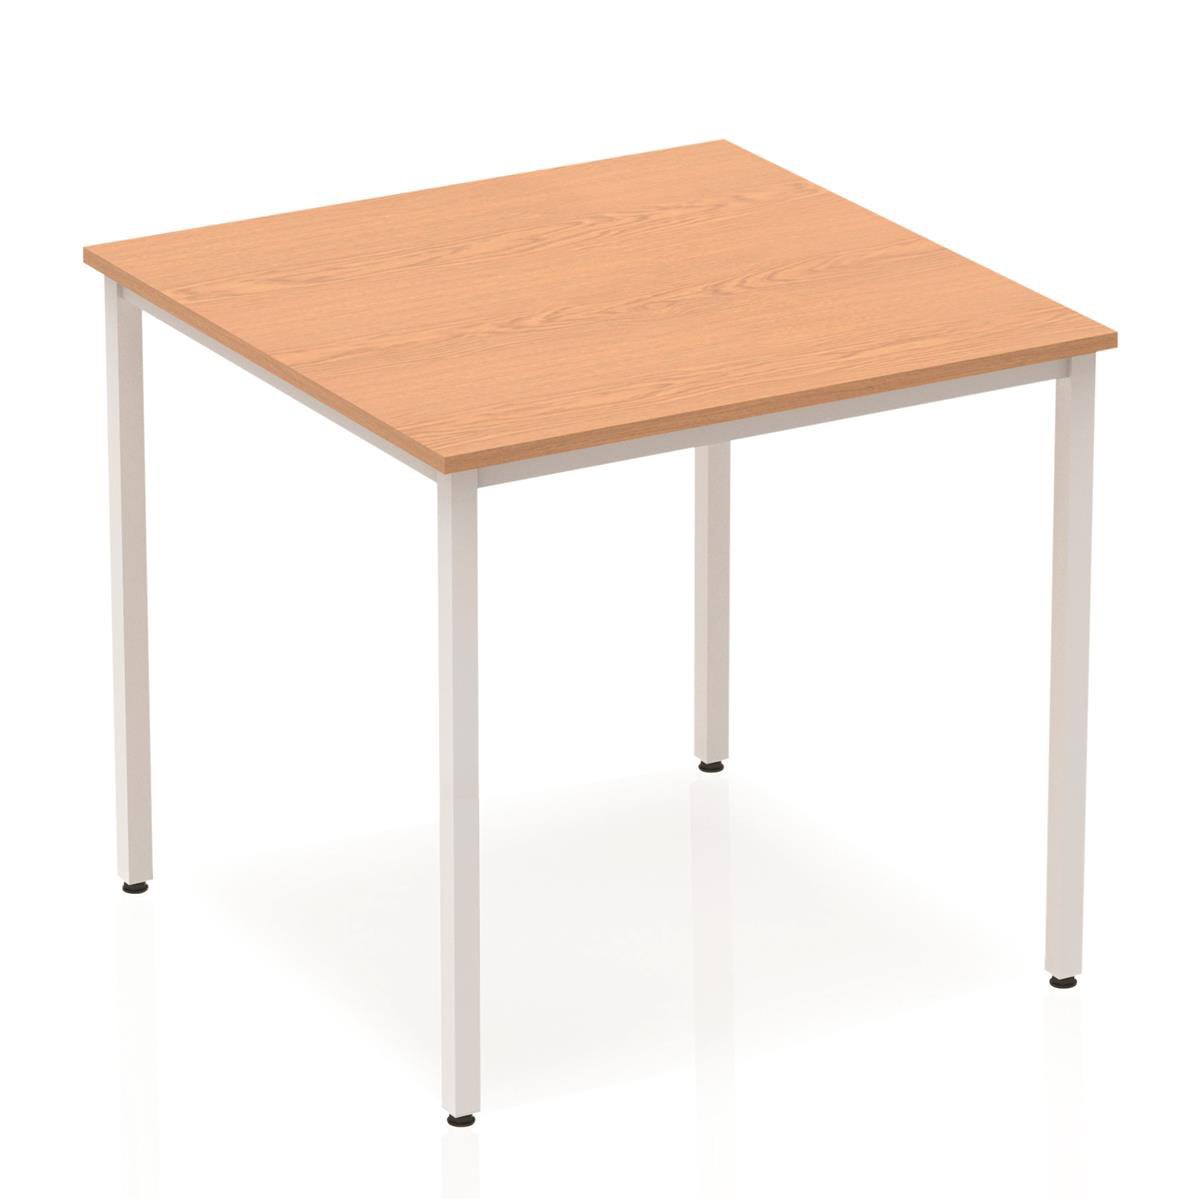 Image for Trexus Square Box Frame Silver Leg Table 800x800mm Oak Ref BF00127